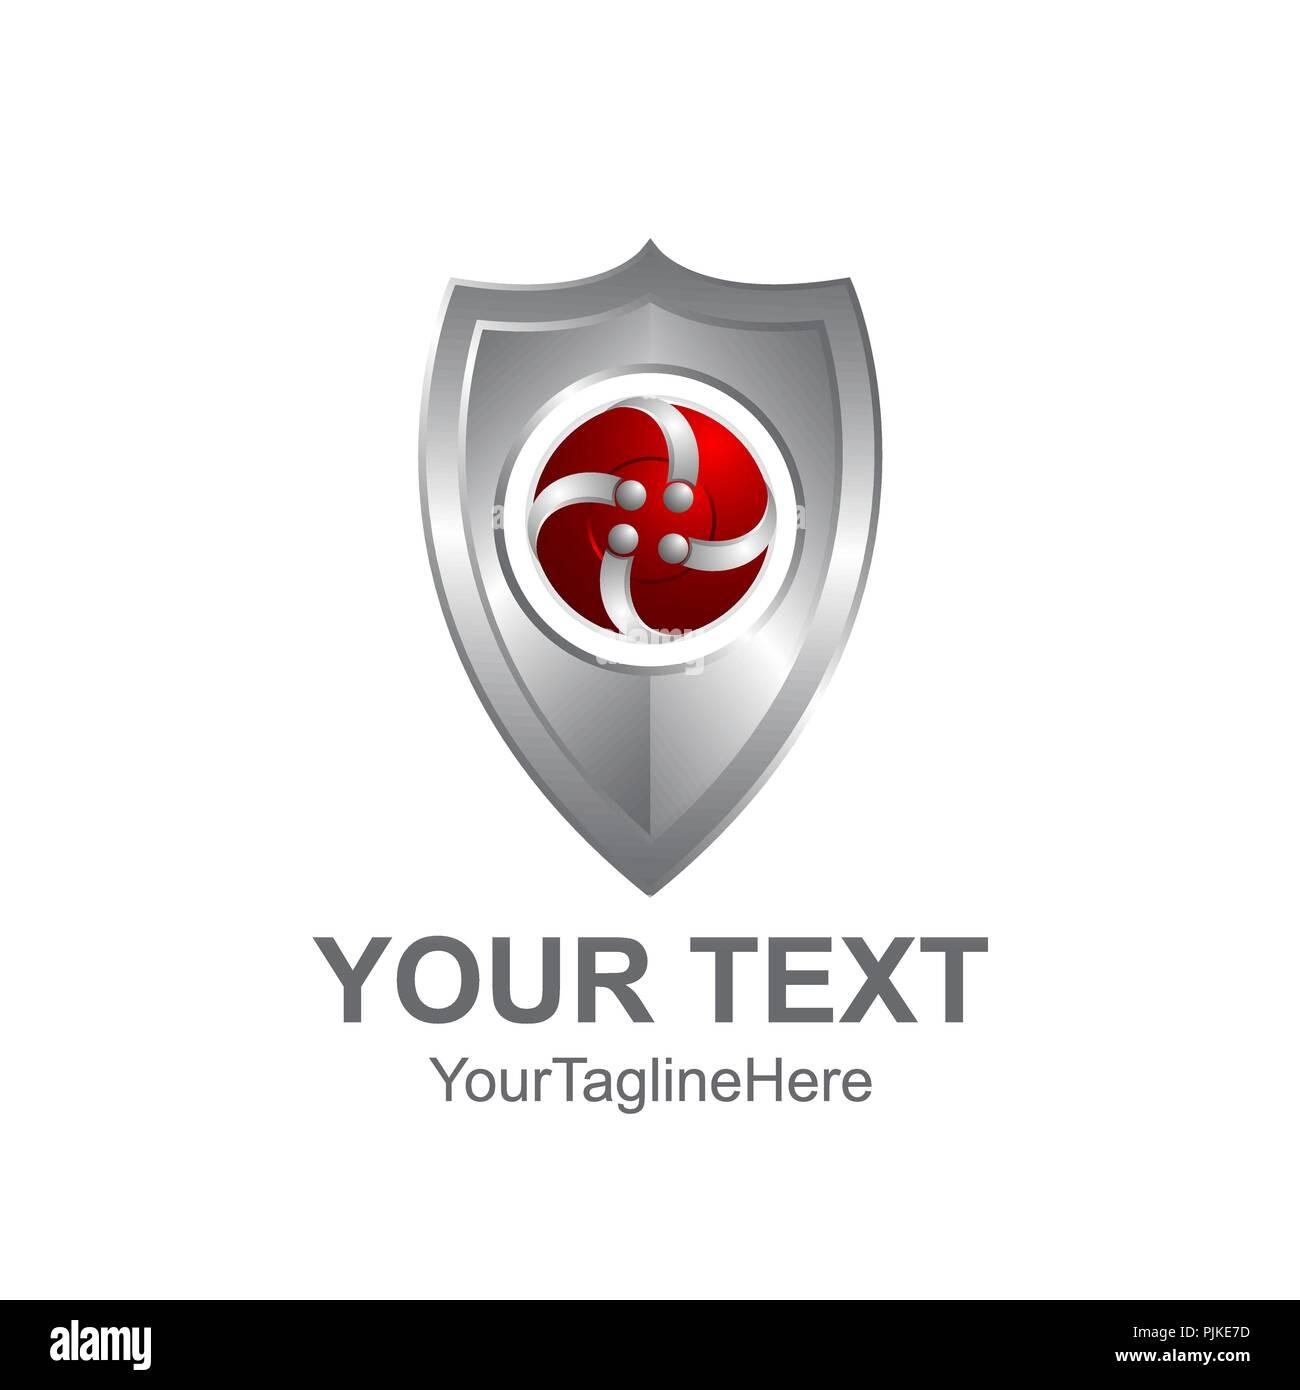 Creative Abstract 3d Badge Shape Shield Vector Logo Design Template